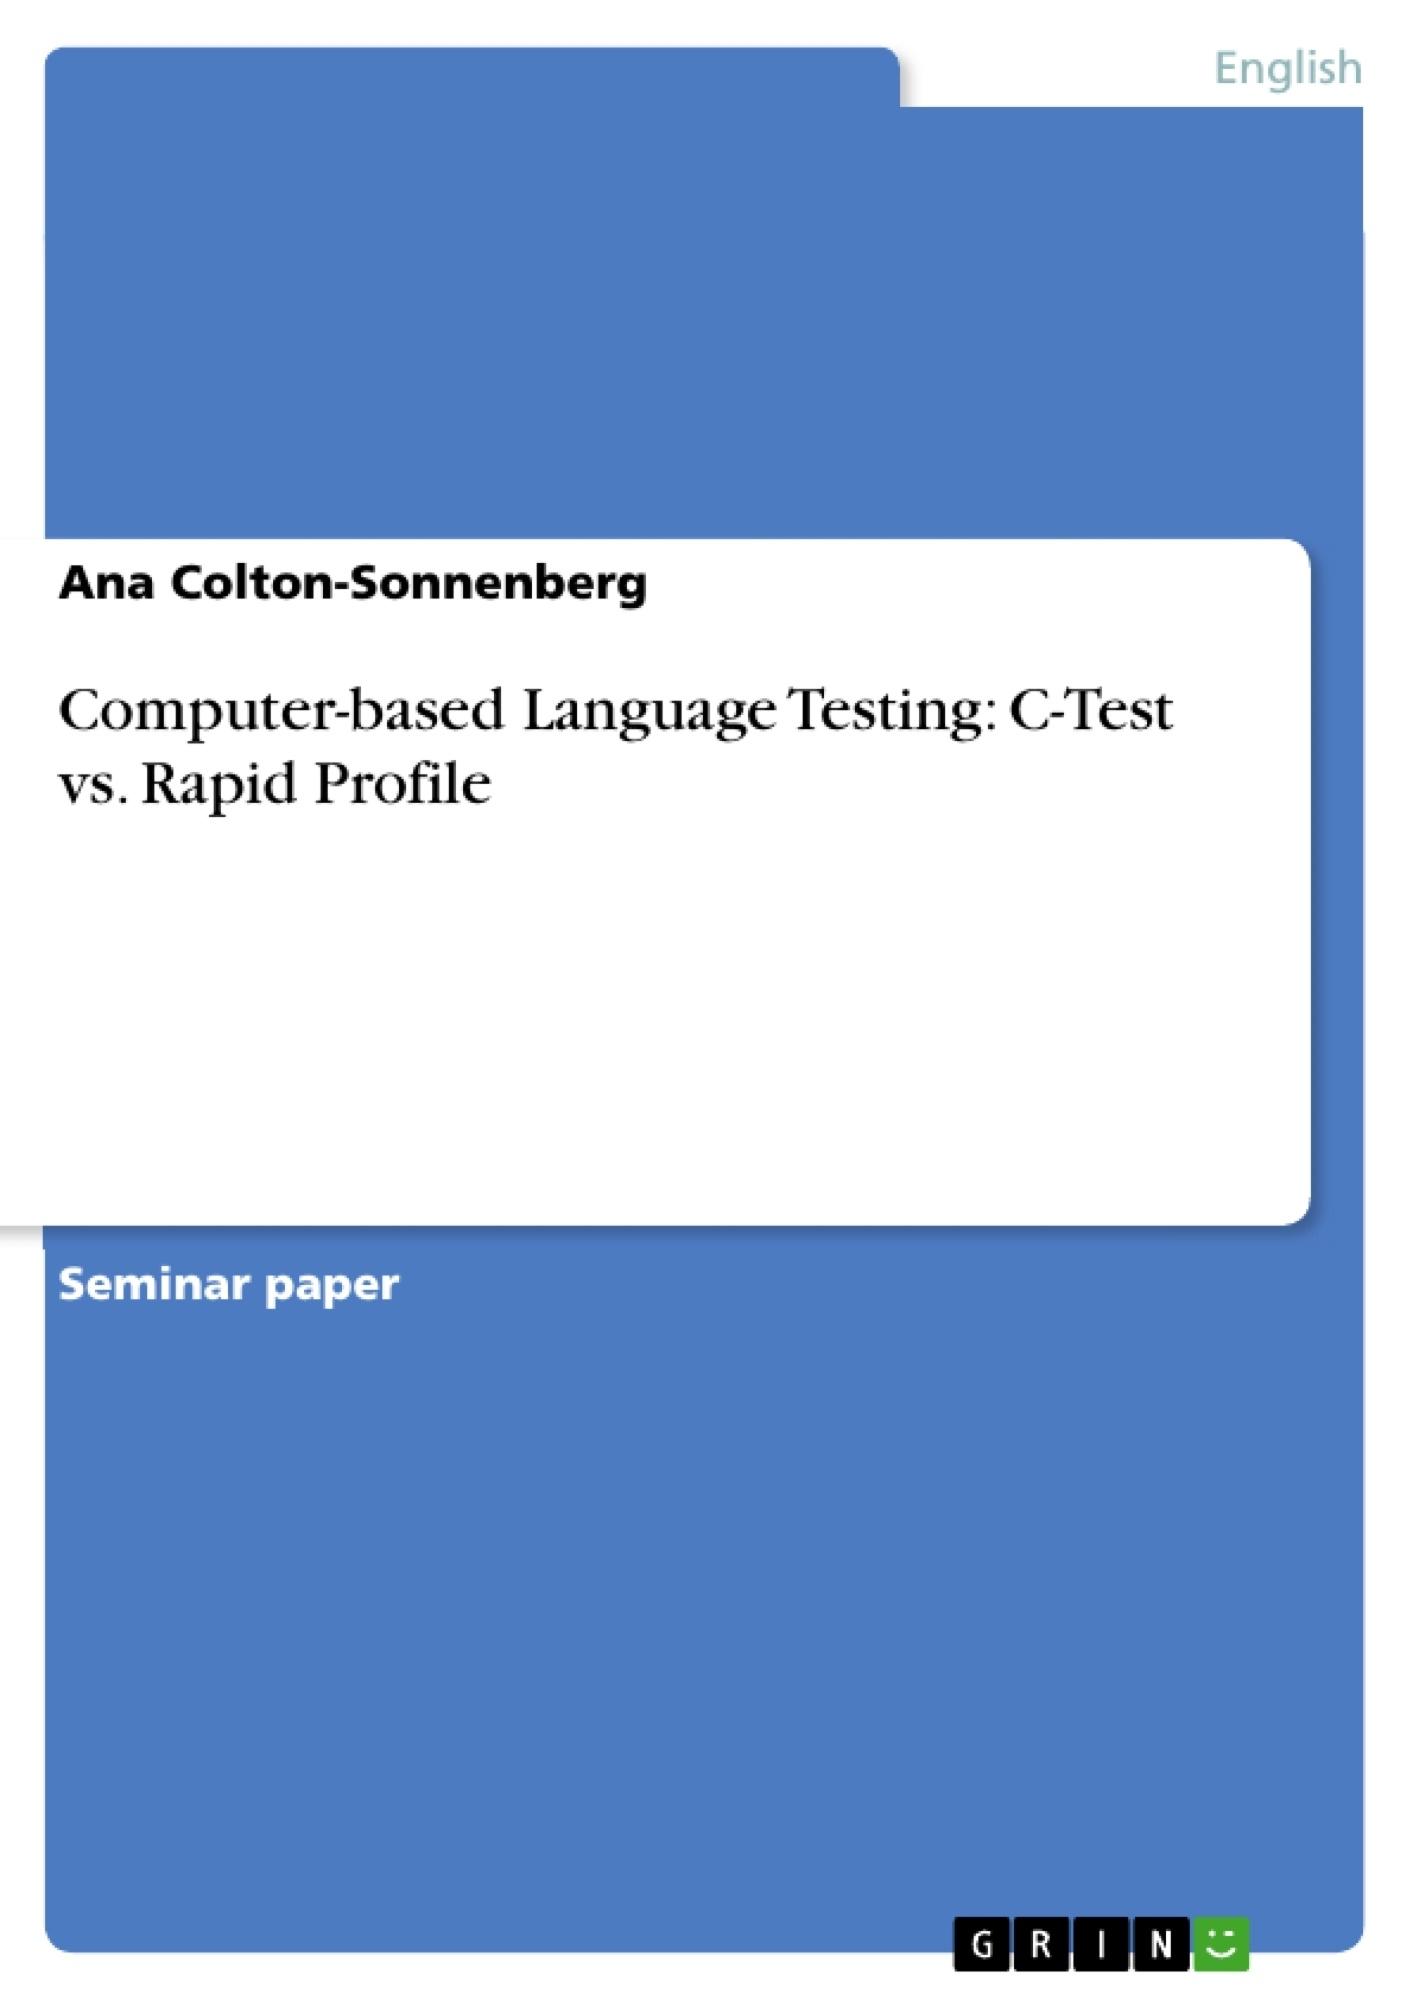 Title: Computer-based Language Testing:  C-Test vs. Rapid Profile